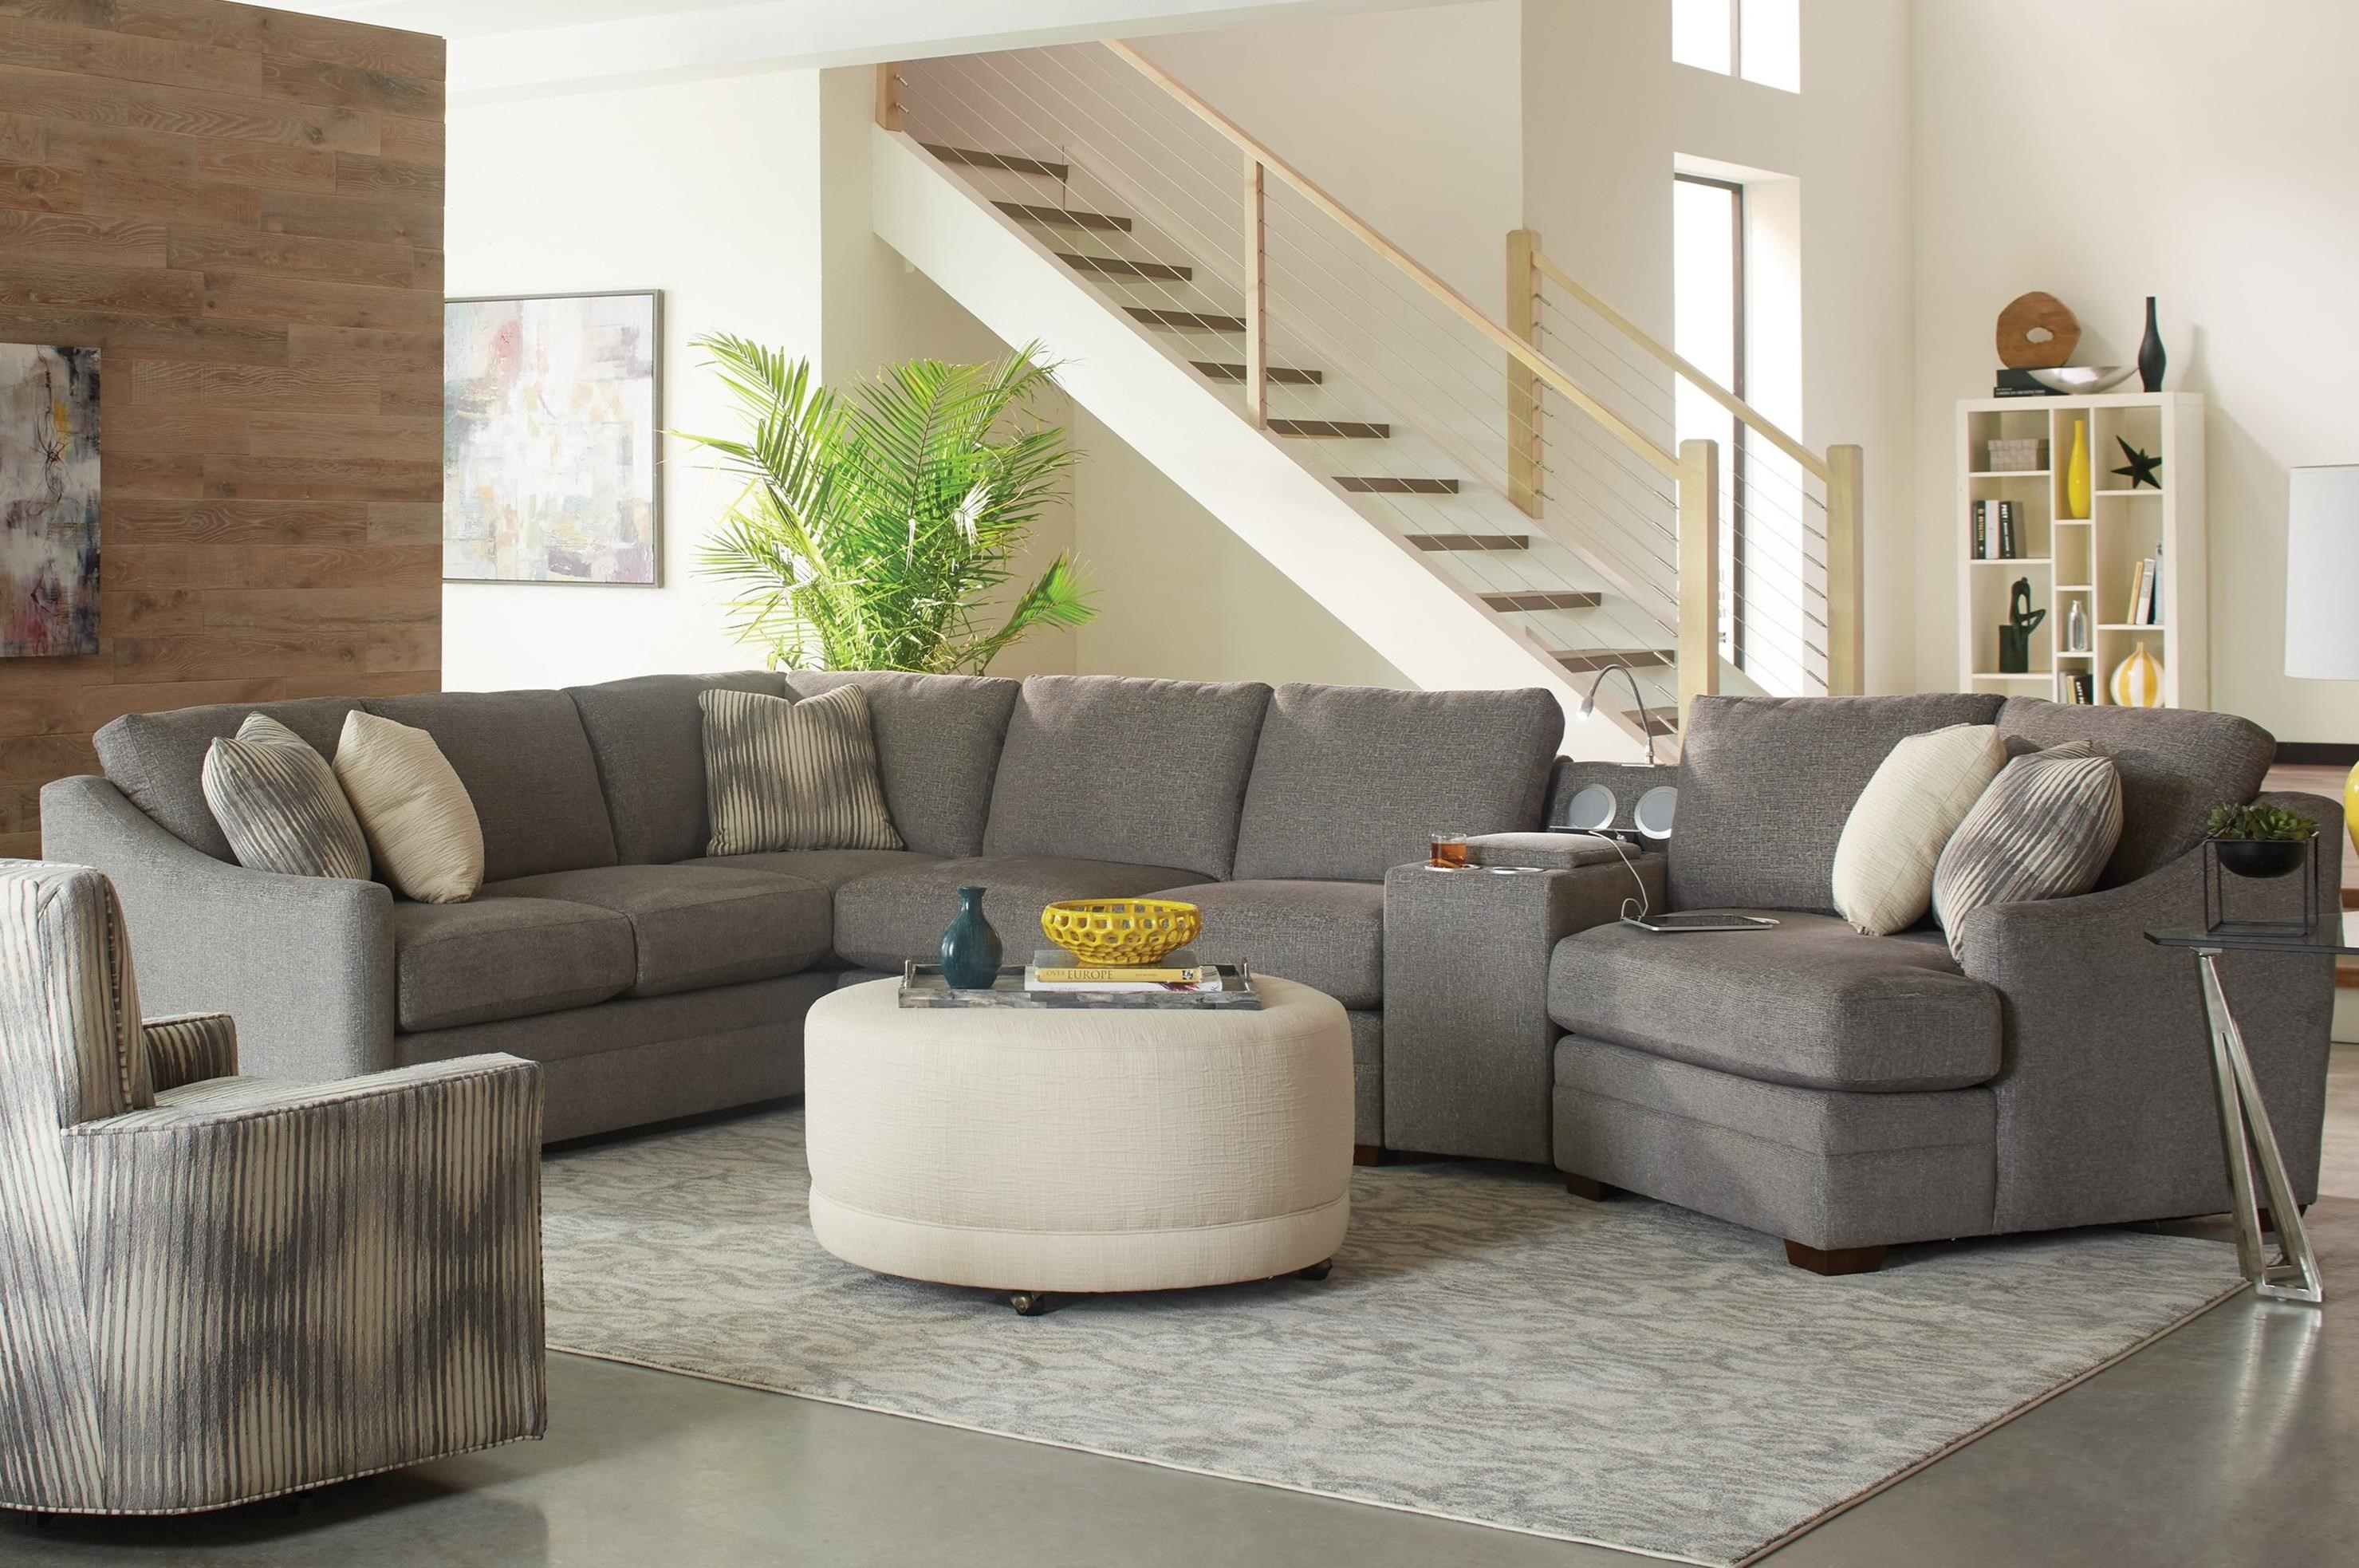 Merveilleux 4 Pc Sectional Sofa W/ Power Console